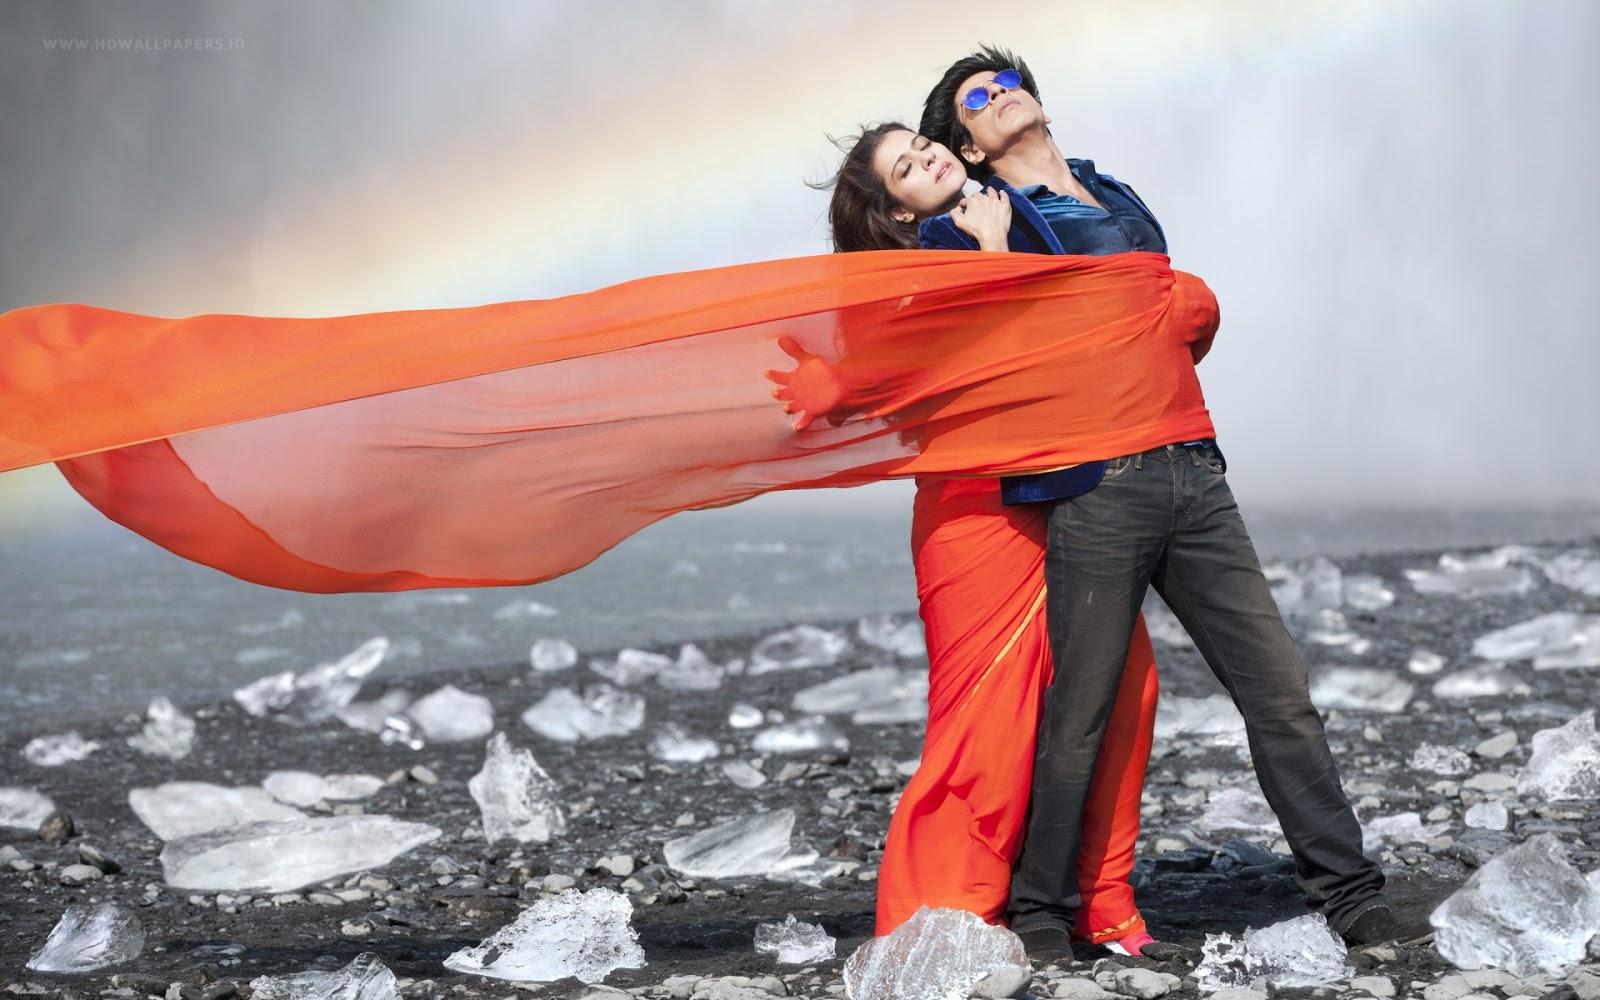 Shah Rukh Khan Kajol Dilwale Movie wallpaper hd 1080p